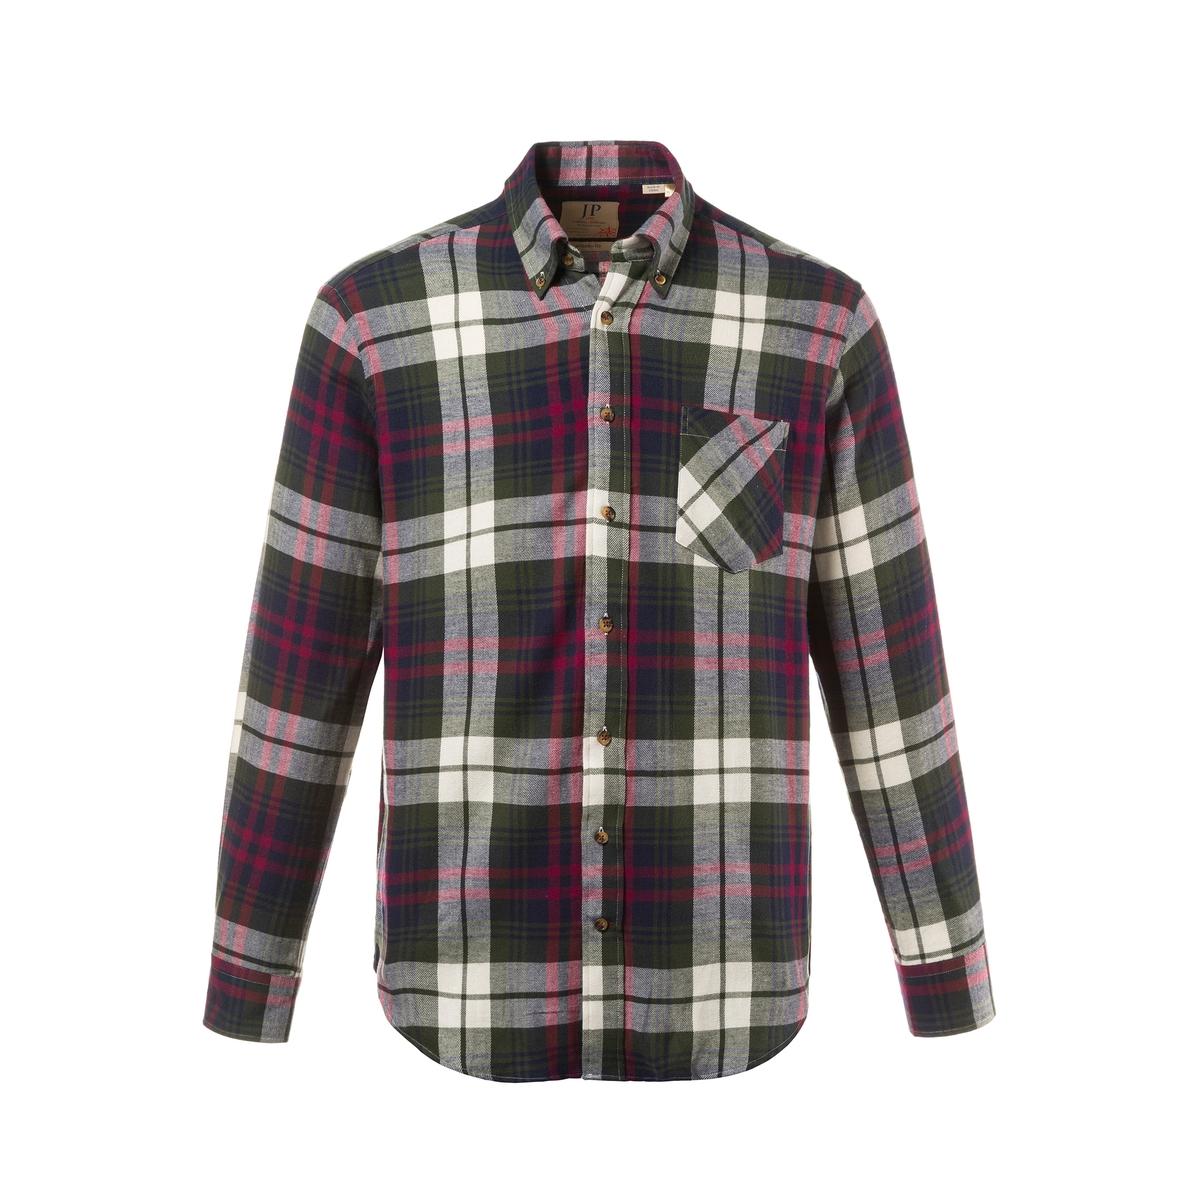 Рубашка<br><br>Цвет: в клетку<br>Размер: L.7XL.6XL.5XL.3XL